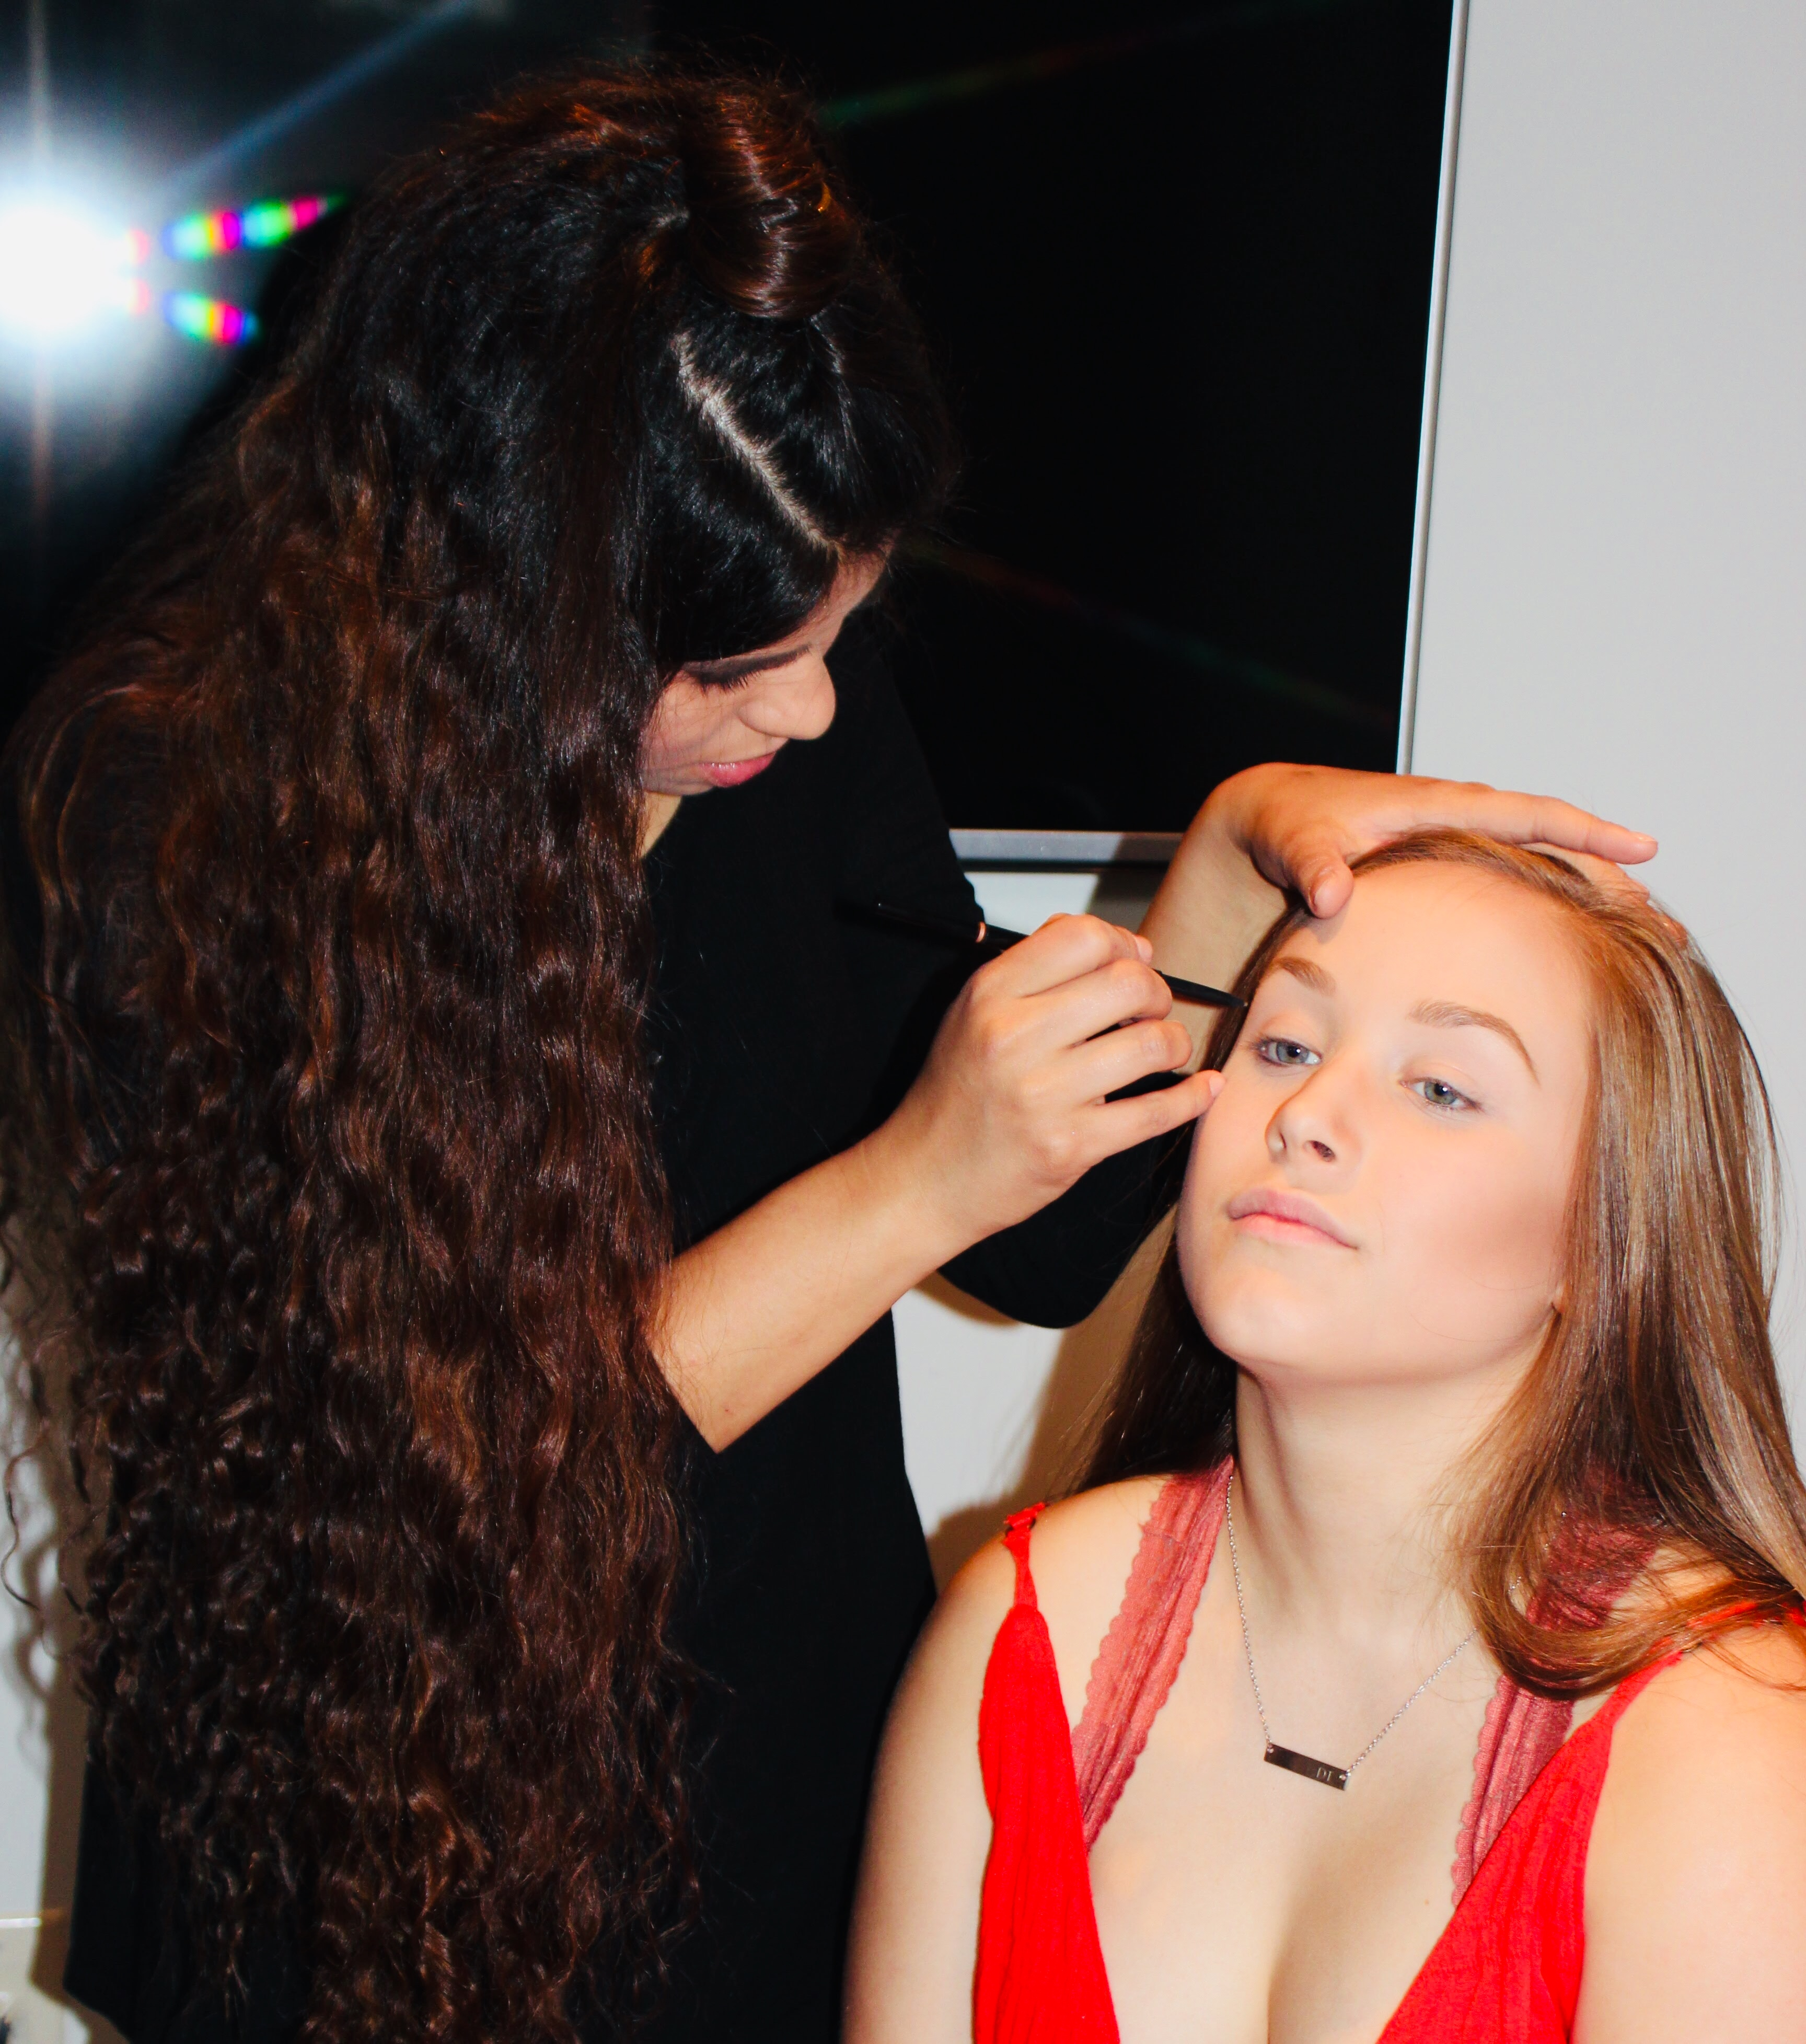 Valen's MakeupBOX